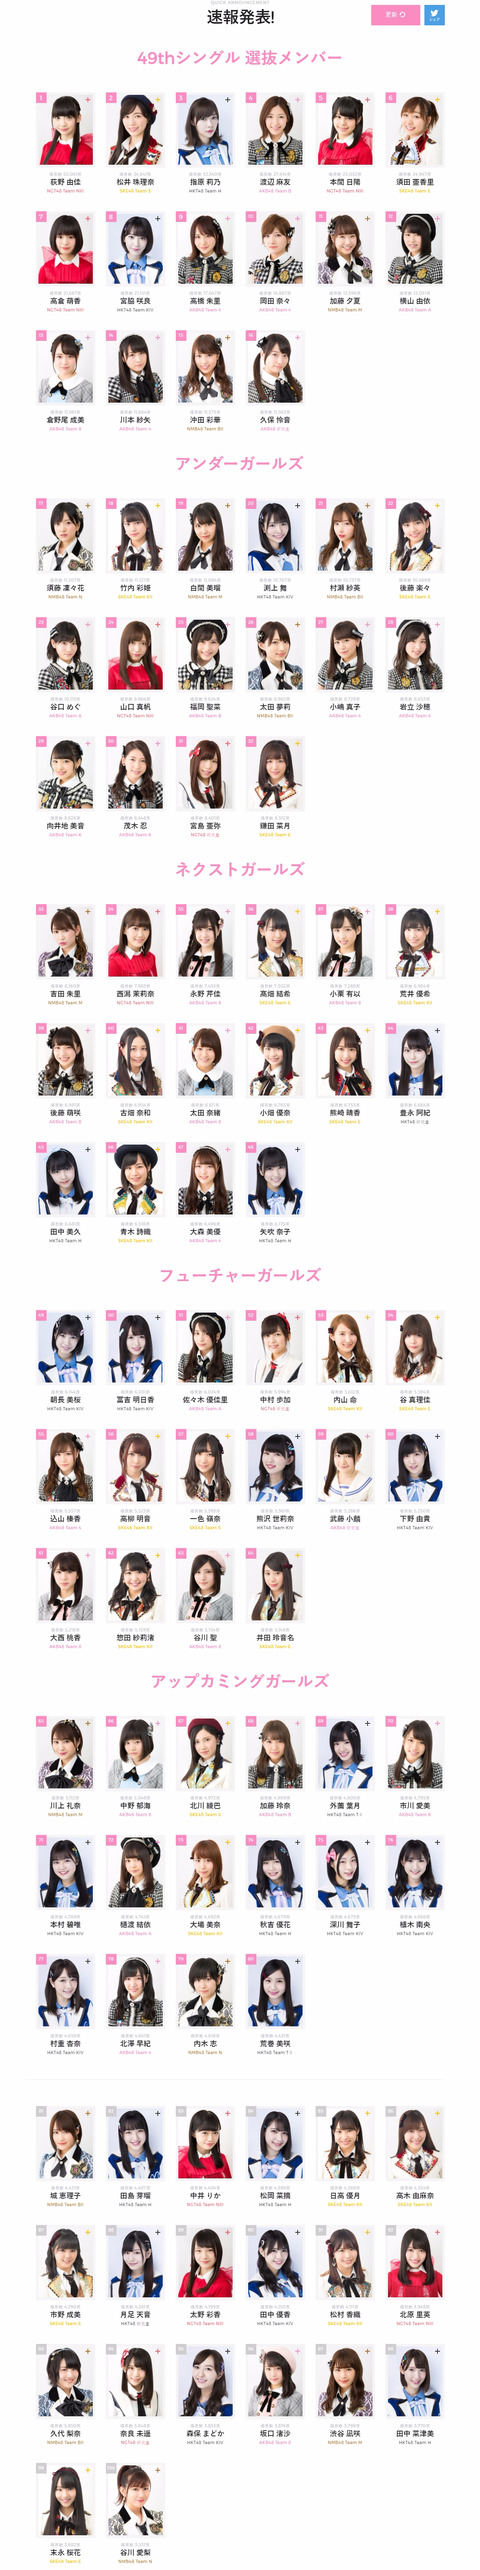 【AKB48総選挙】速報1位がまさかの荻野由佳!!!2位松井珠理奈、3位指原莉乃、4位渡辺麻友